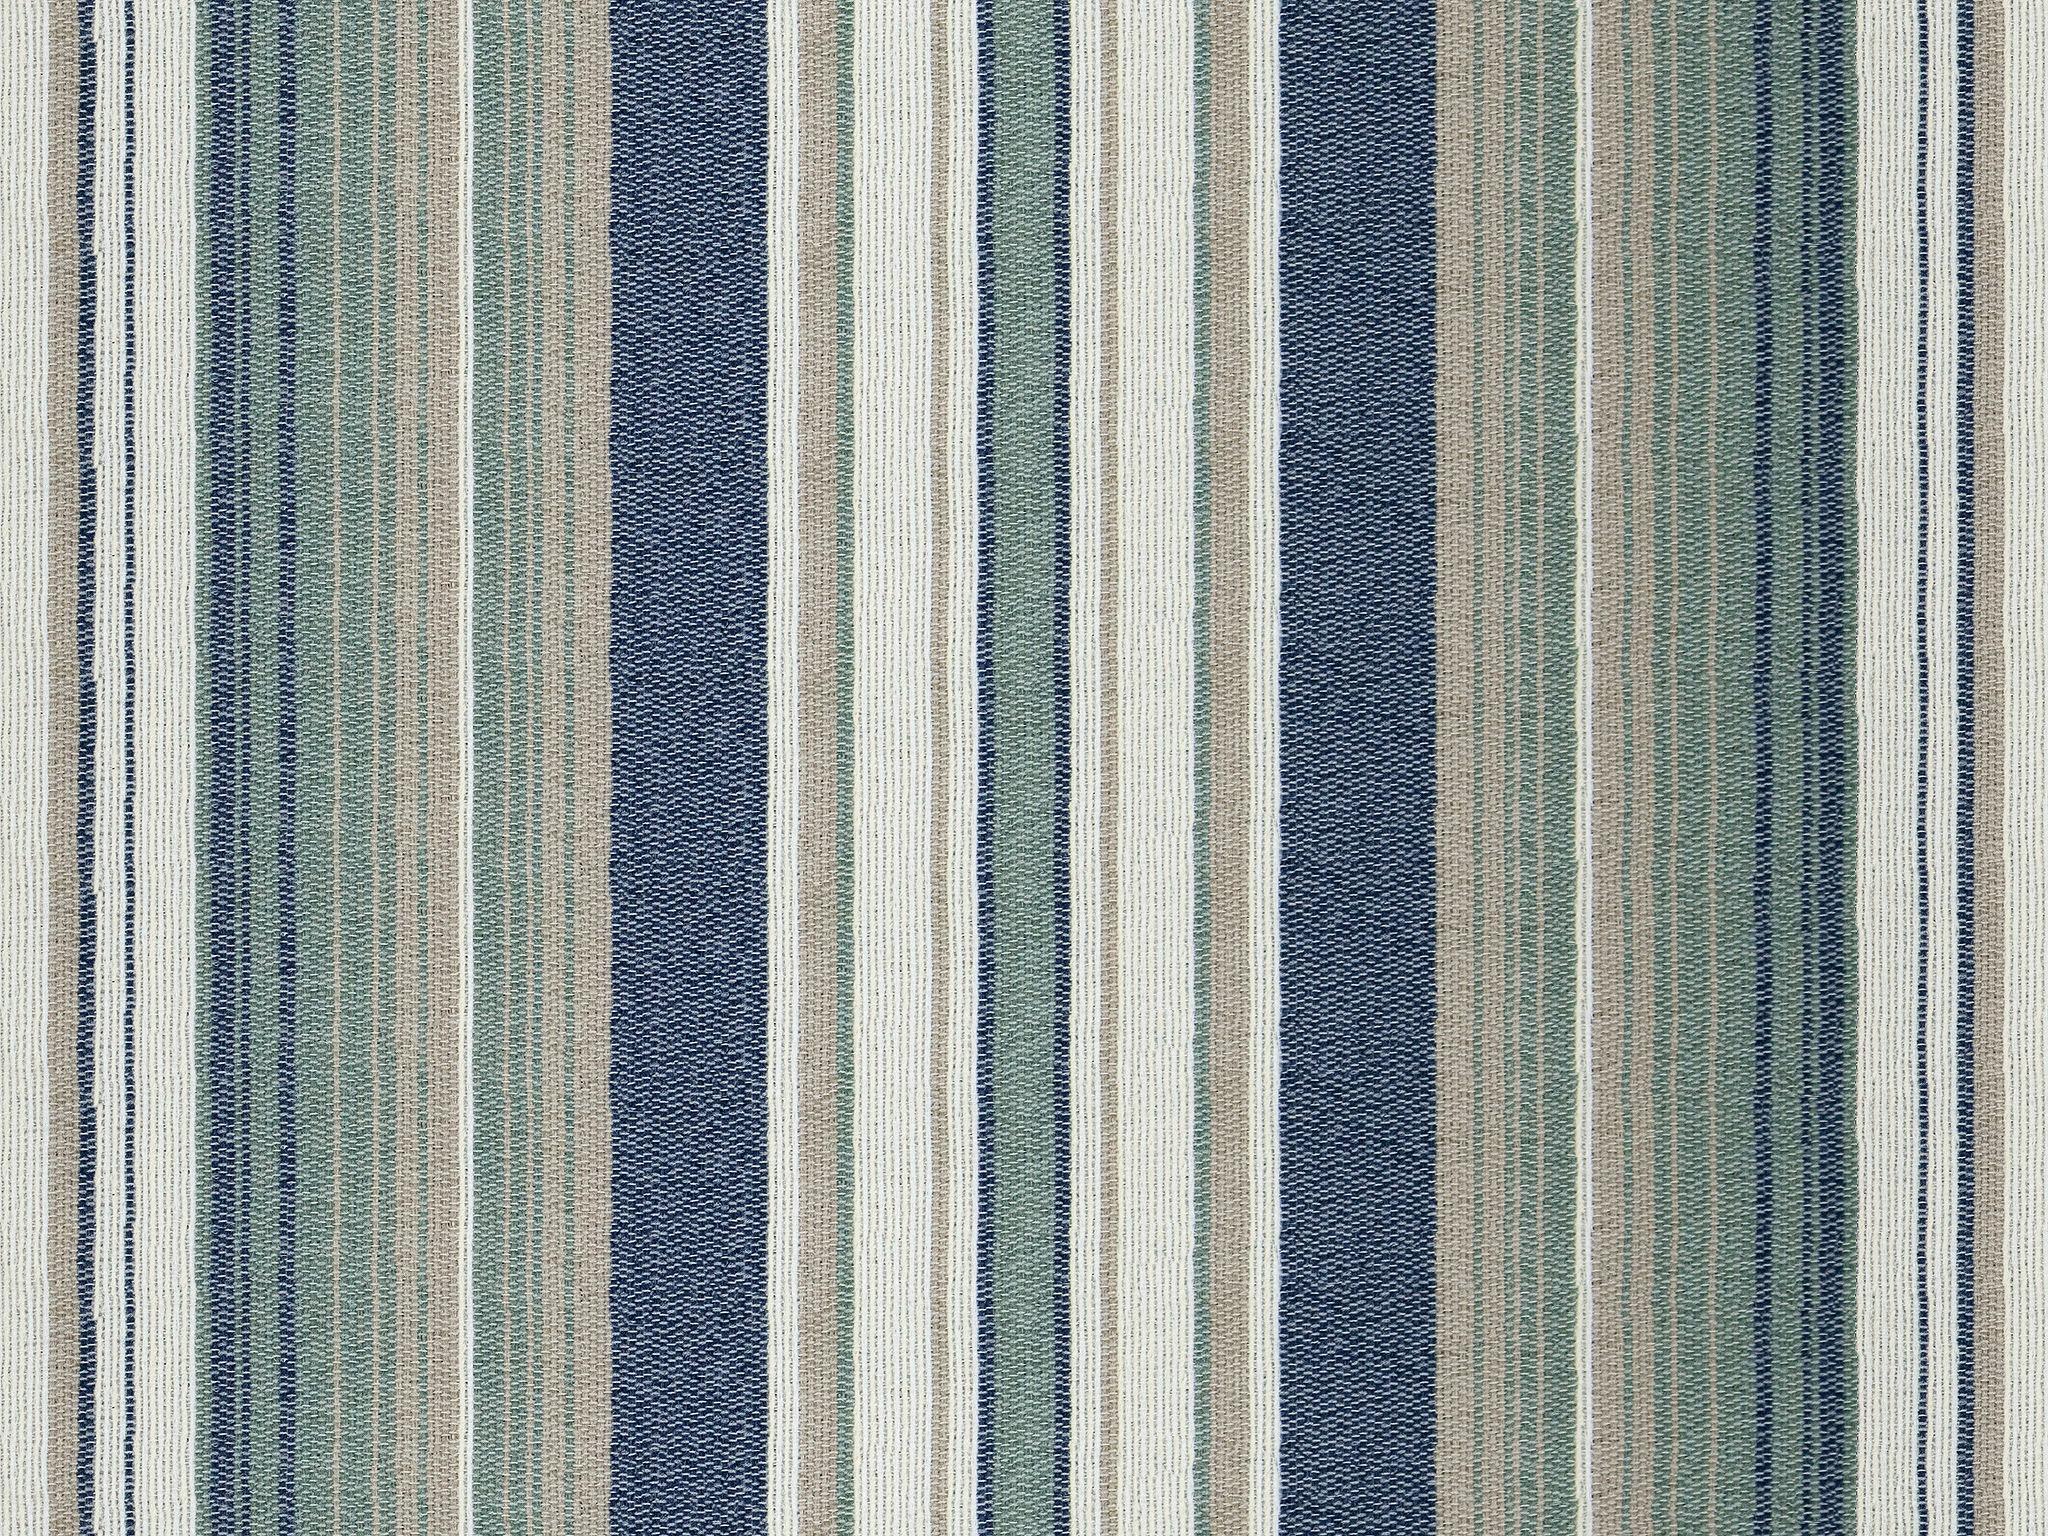 Braxton Culler 0213-61 - Kalin Home Furnishings - Ormond